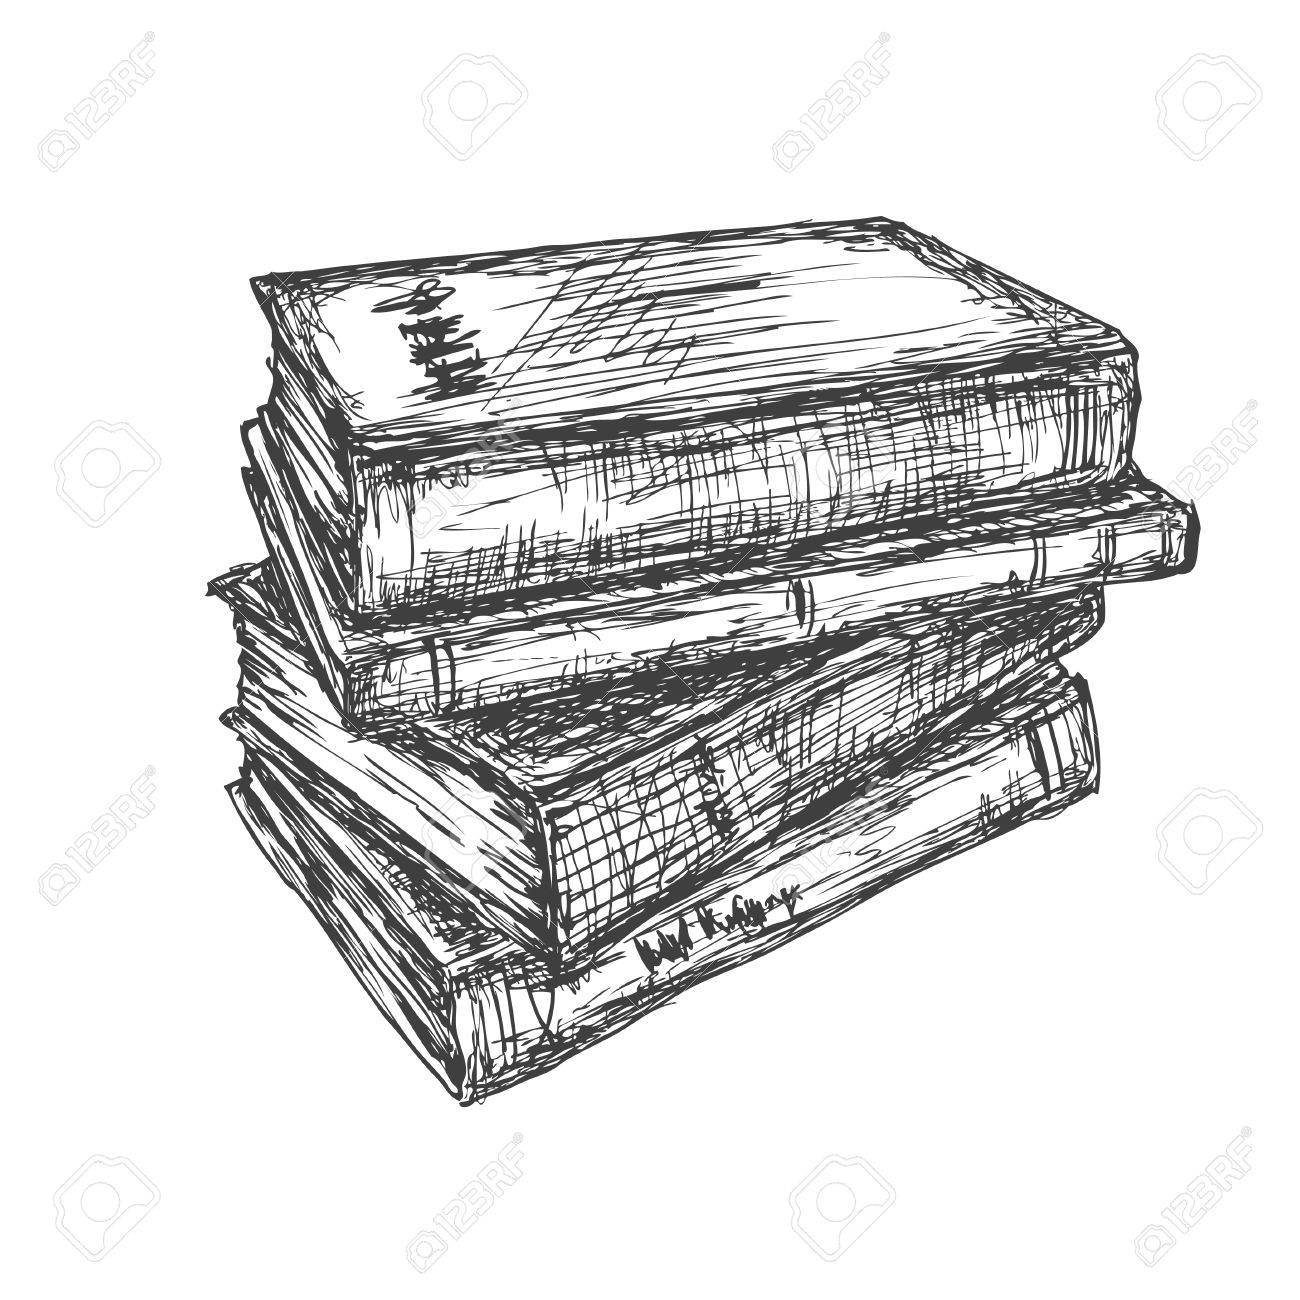 картинки рисунки книги